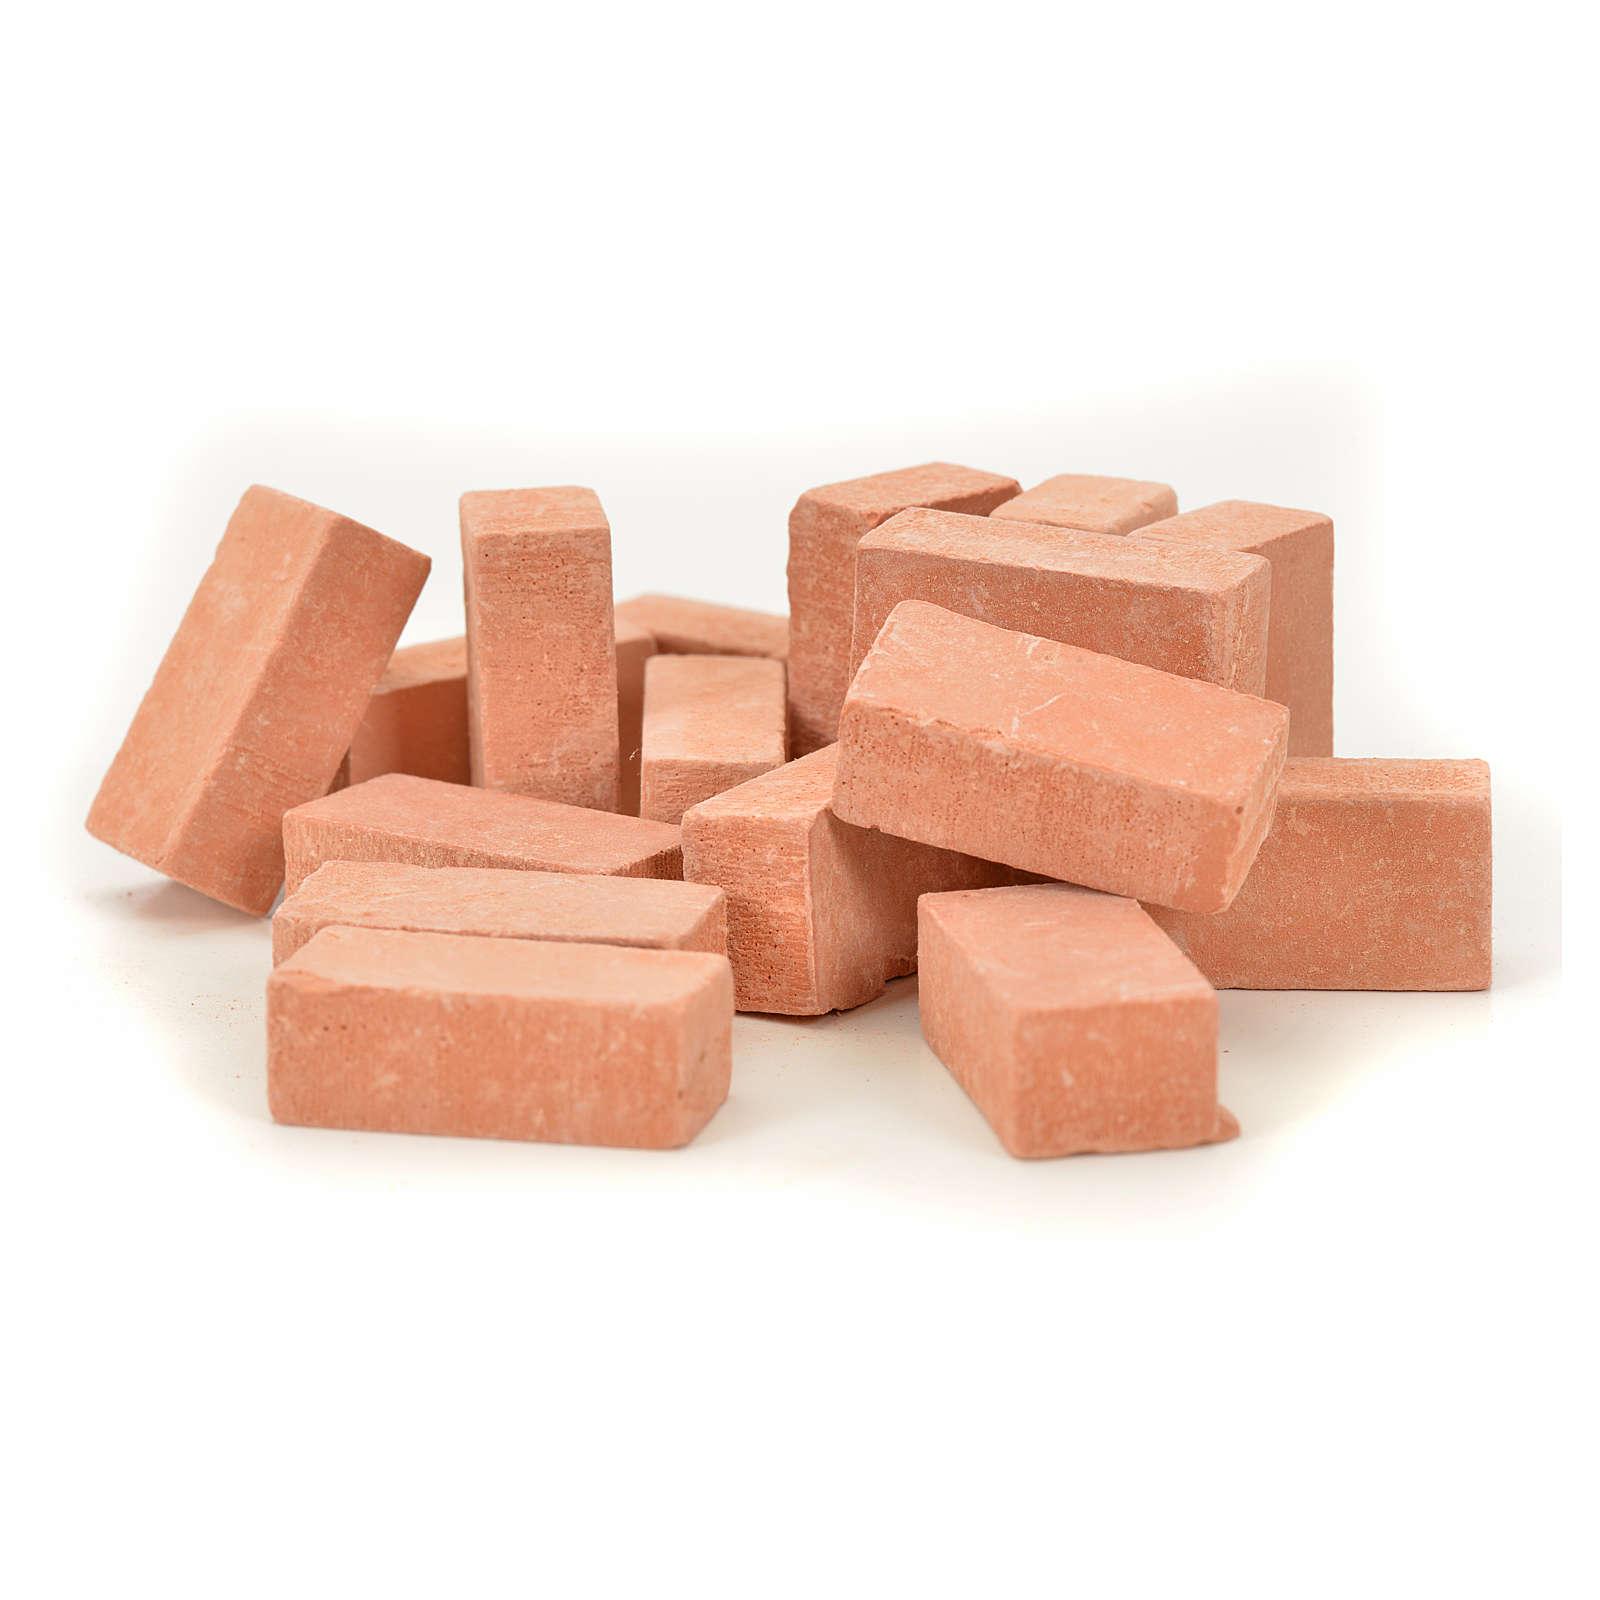 Nativity accessory, resin bricks 20x10mm, 16pcs 4